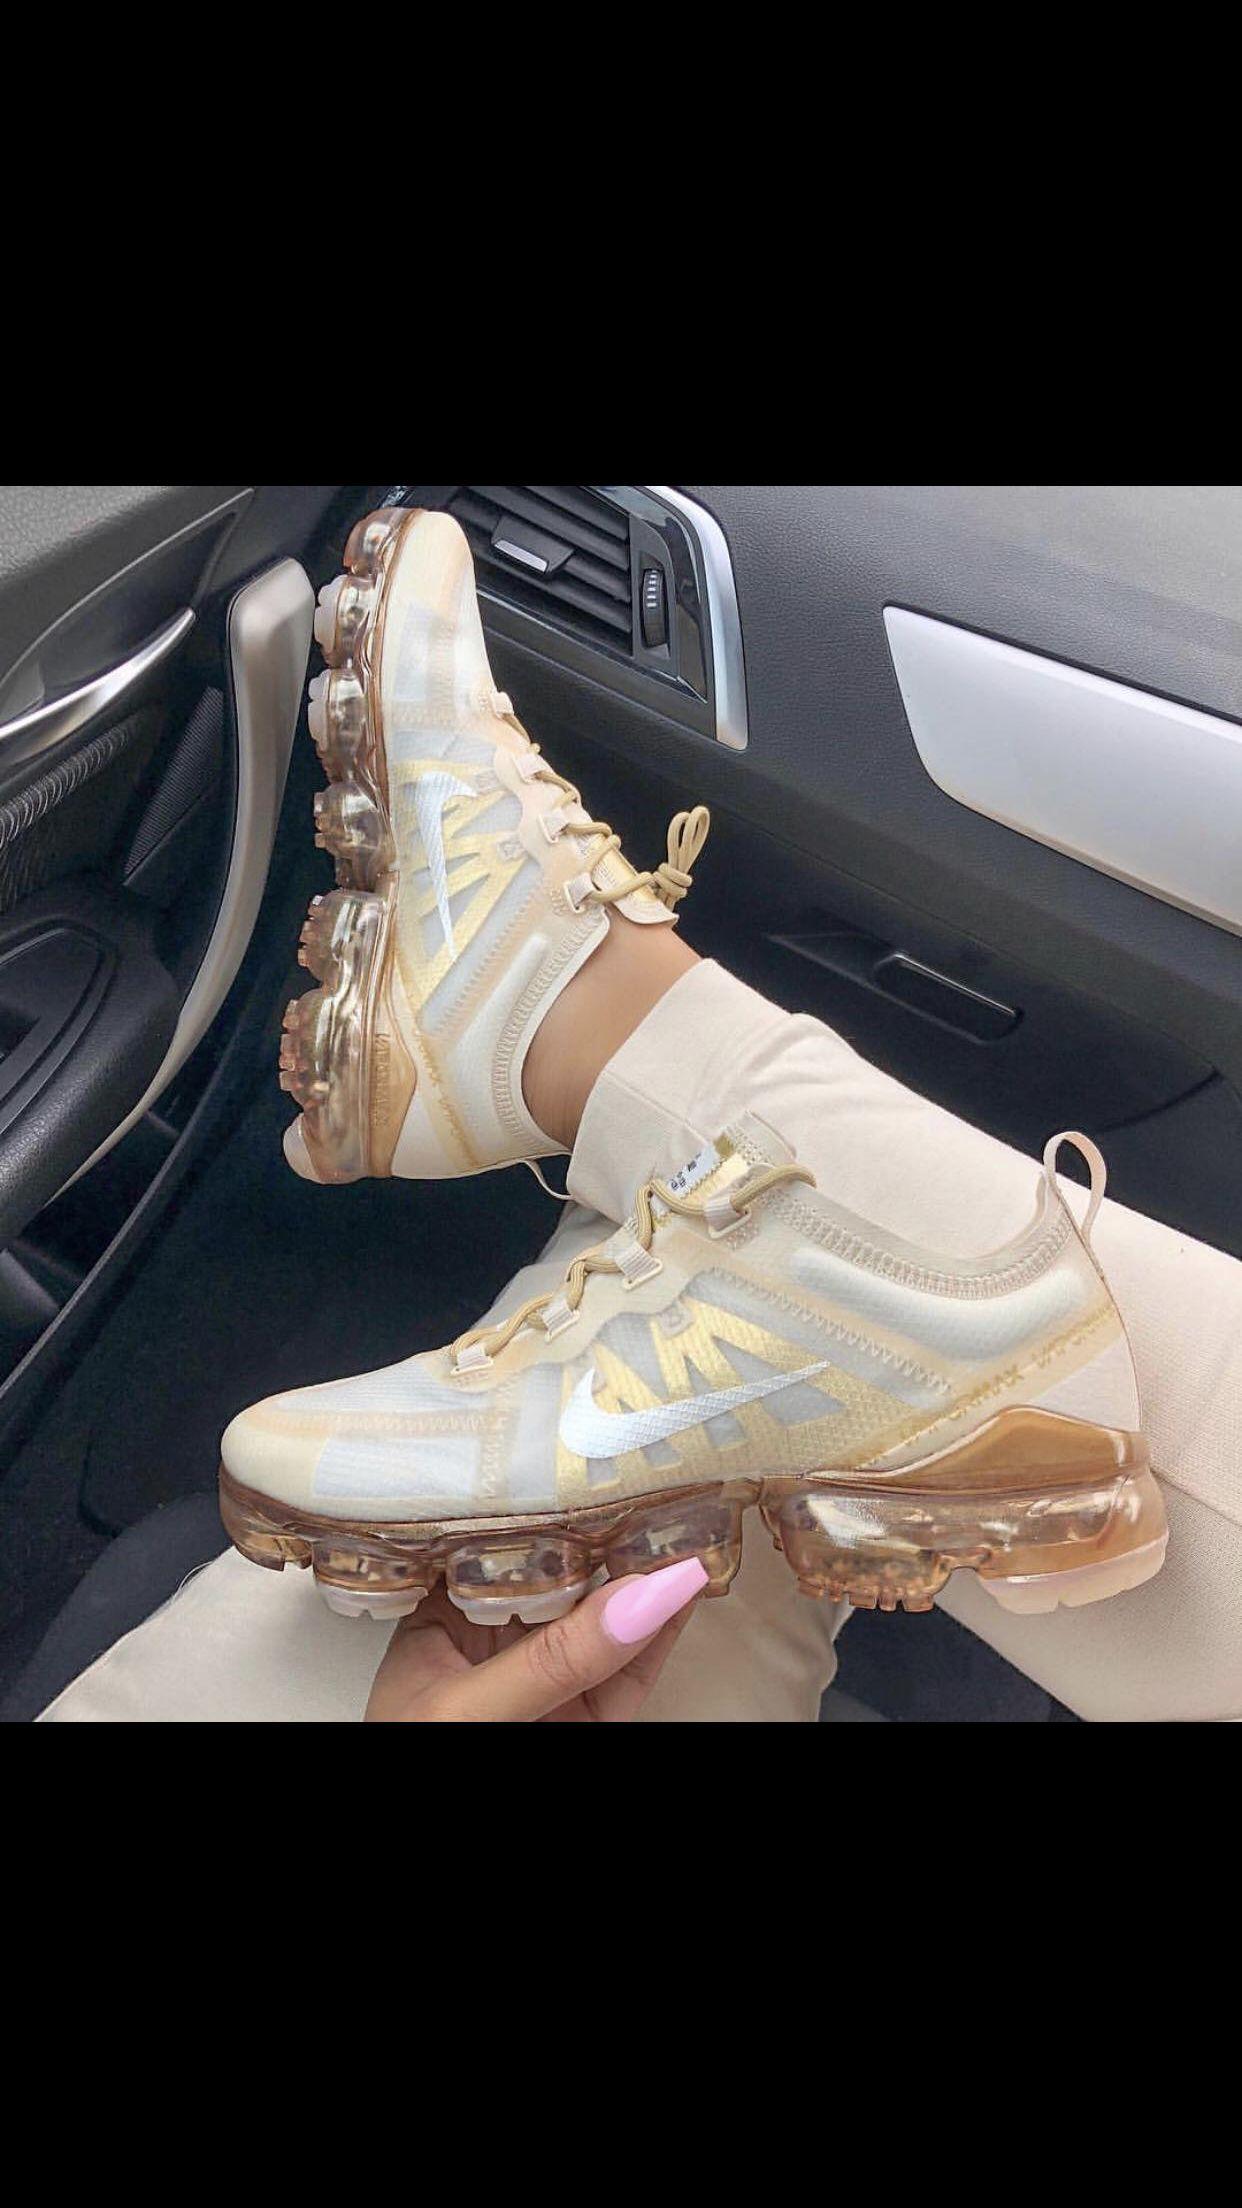 Pin Von Ahmet Albakir Auf Nike Schuhe In 2019 Schuhe